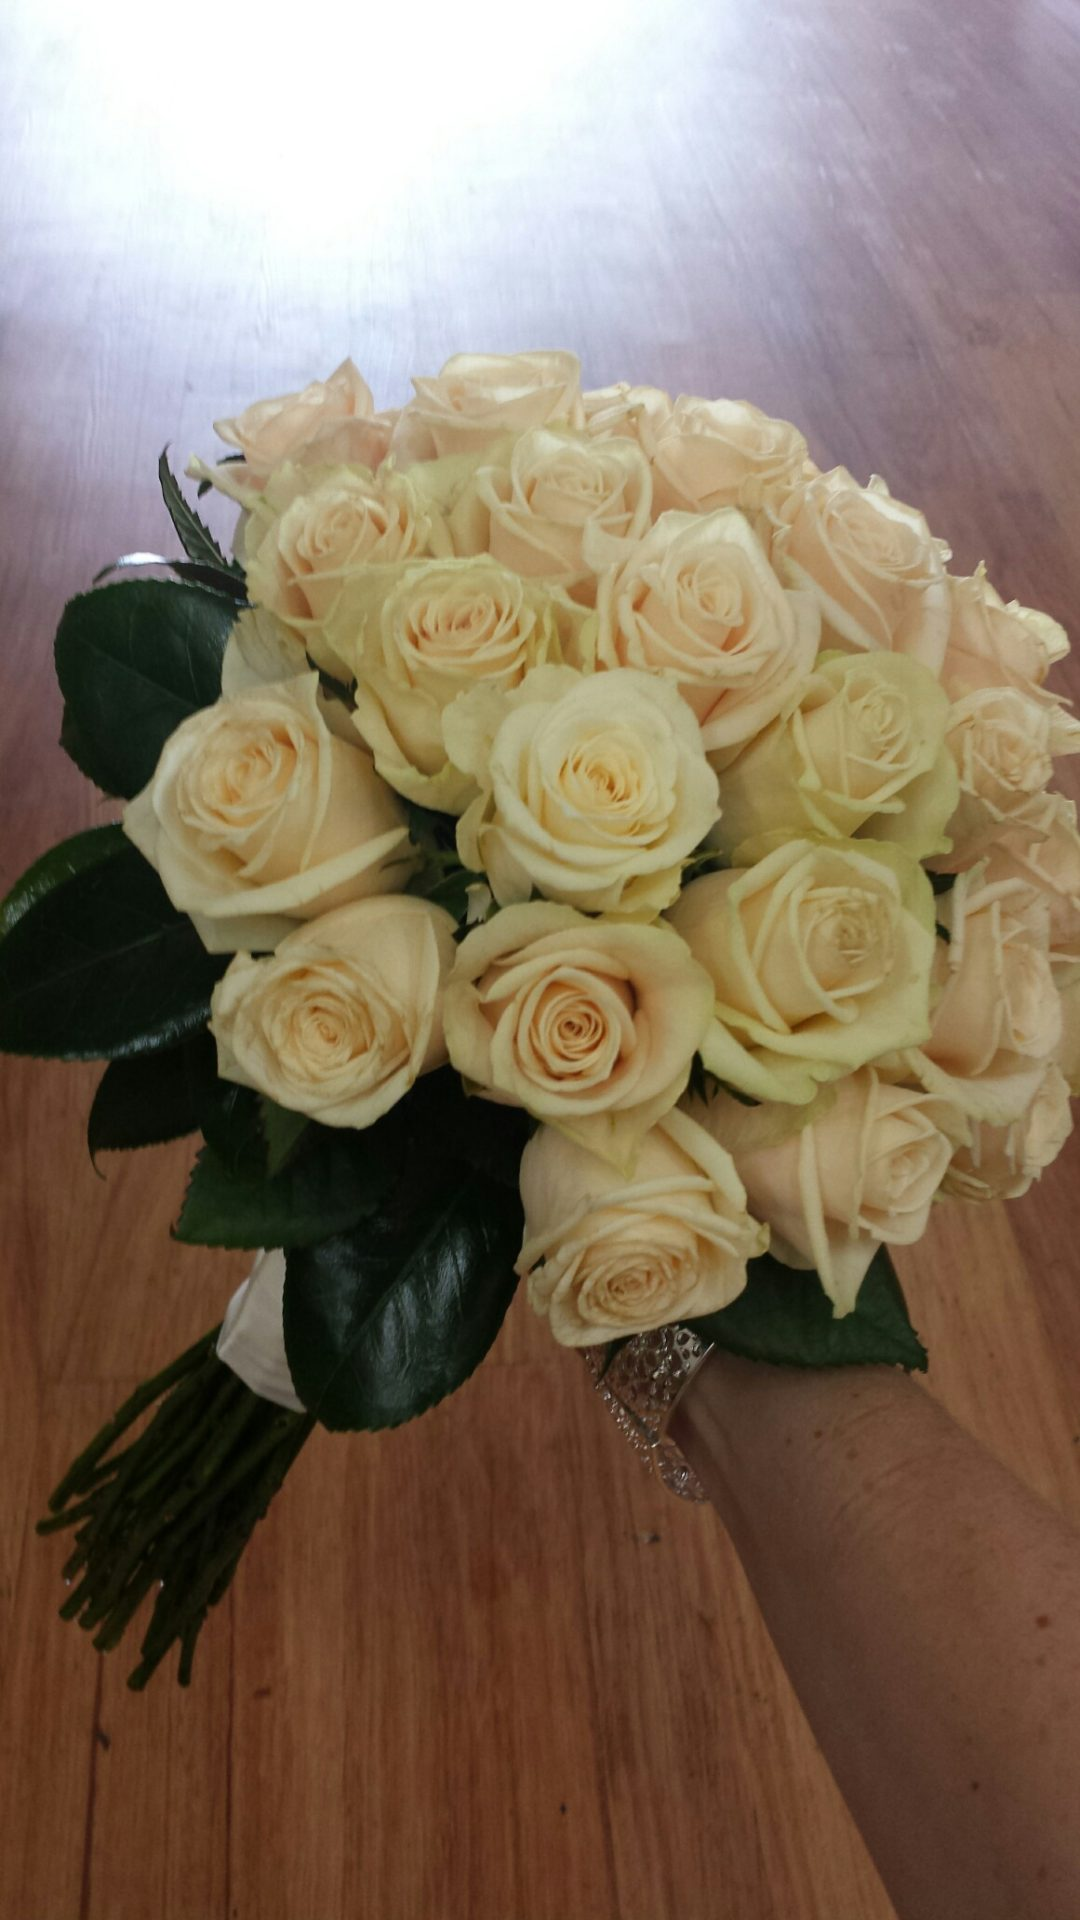 Cream rose compact bouquet